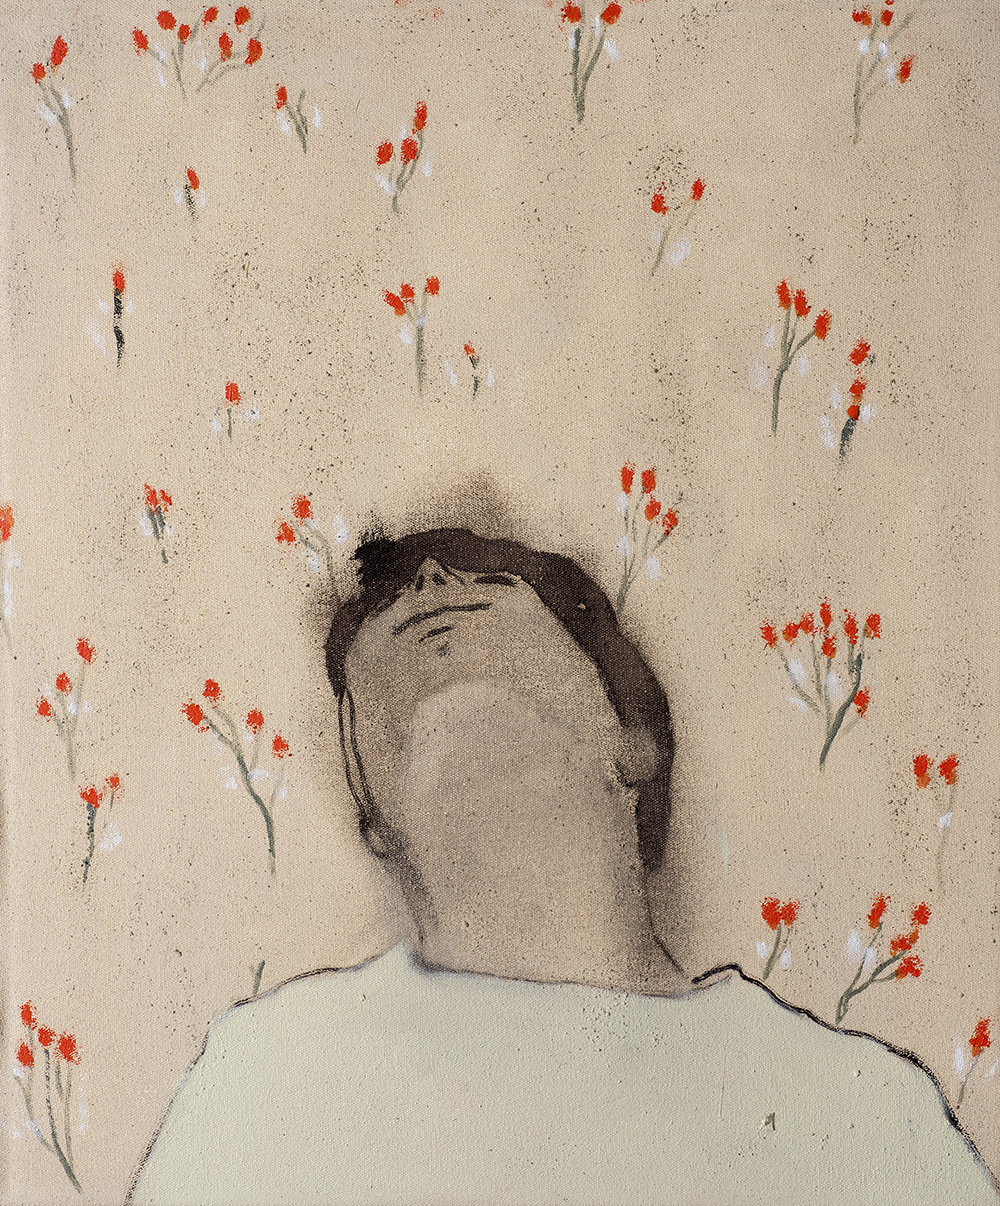 Francisco Rodriguez.<em> Lying</em>, 2019. Oil on canvas, 23 5/8 x 19 5/8 inches (60 x 50 cm)